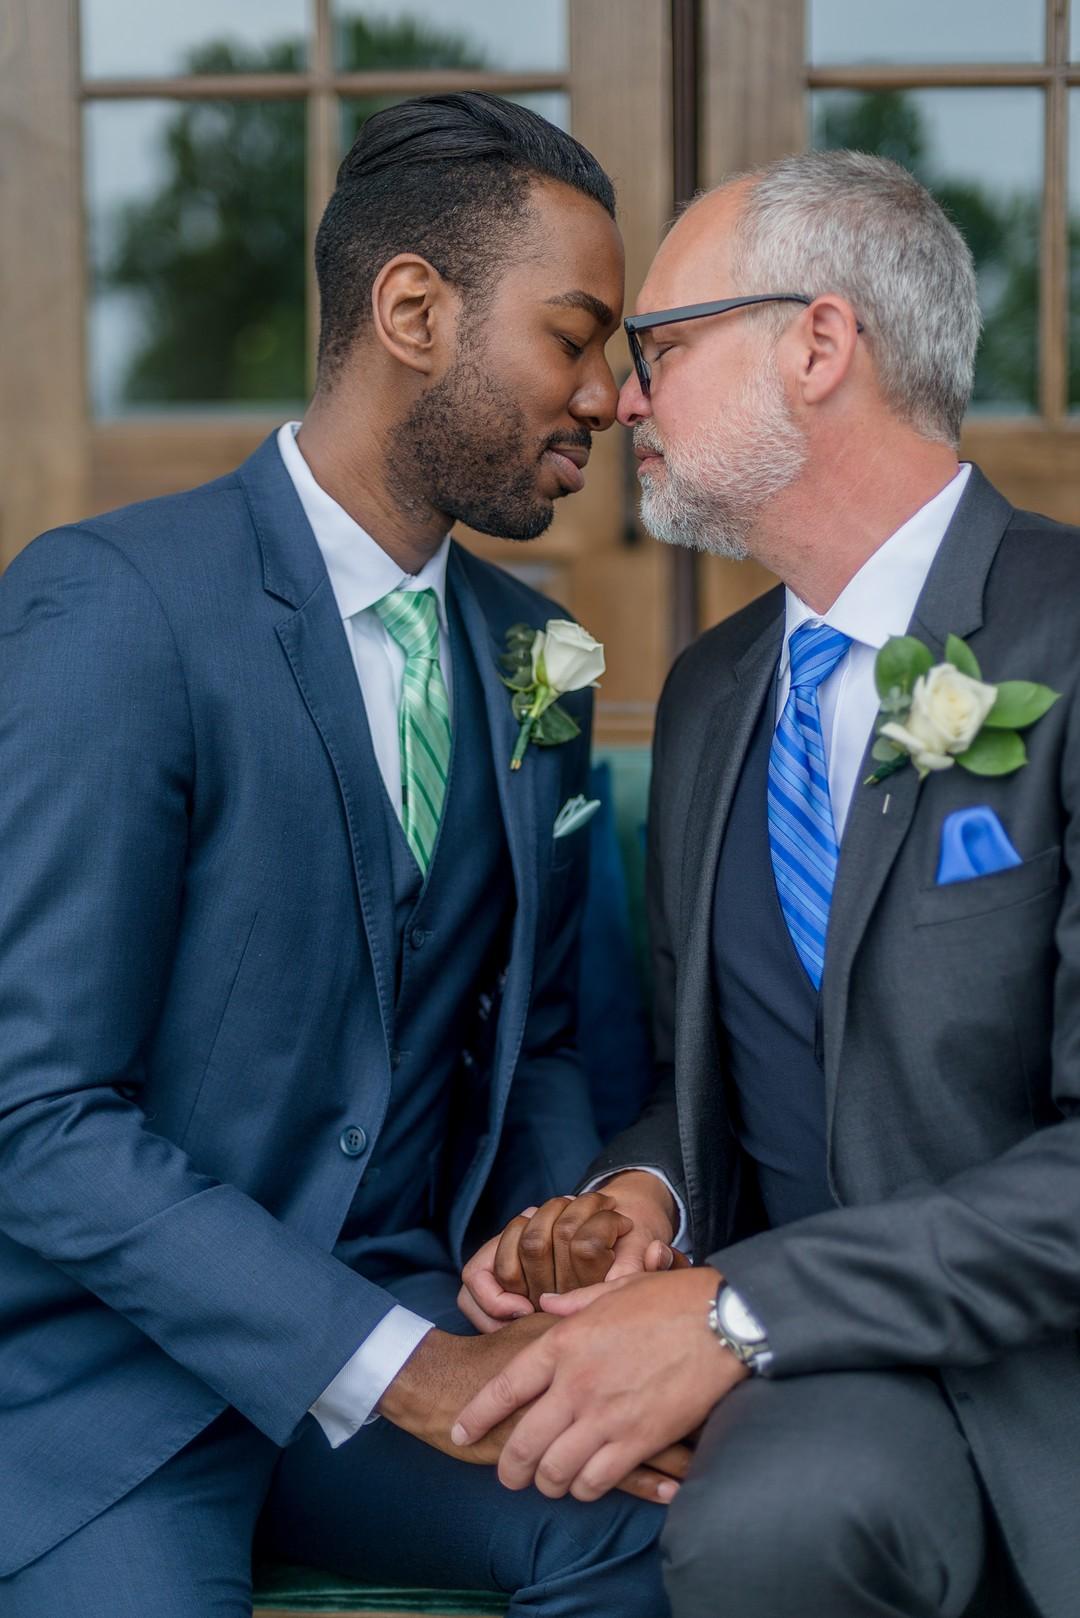 Columbus wedding planner - gay wedding - blue and green wedding colors - cincinnati wedding designer - wedding planning cincinnati